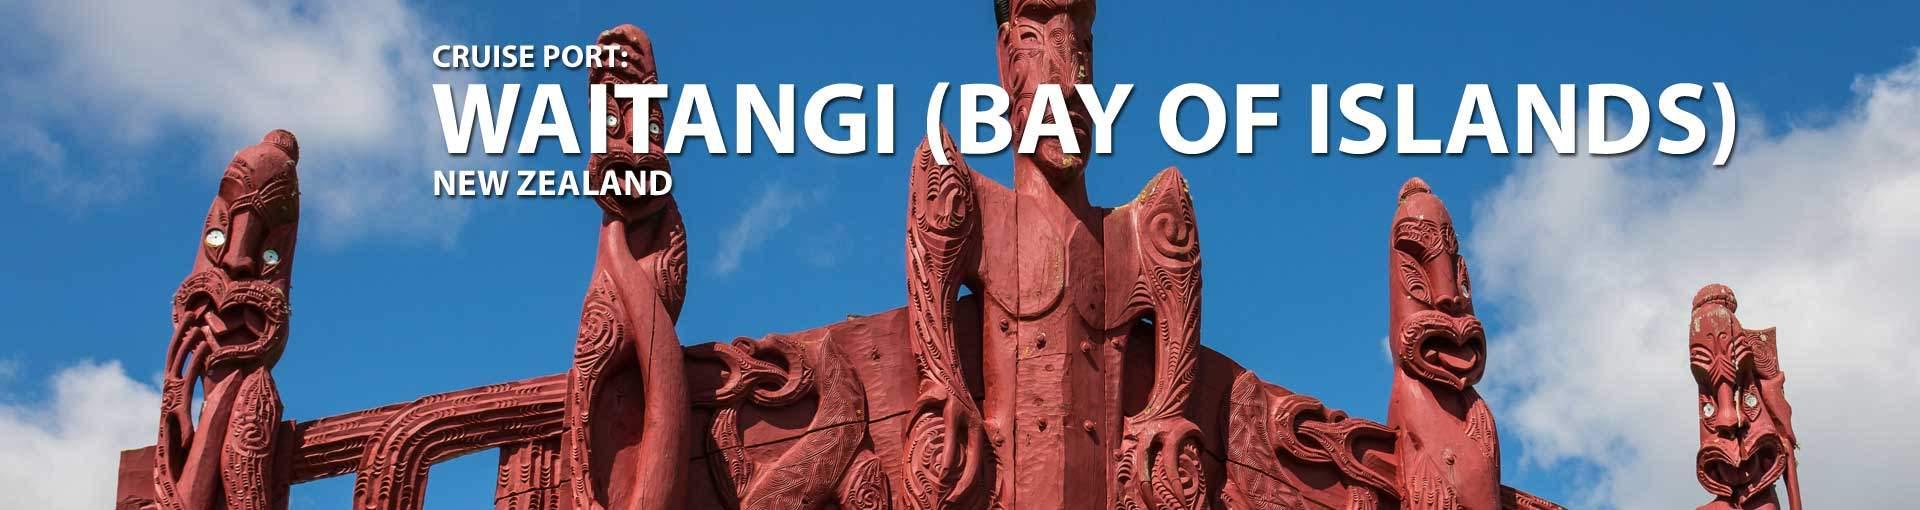 Cruises to Waitangi (Bay Of Islands), Nz